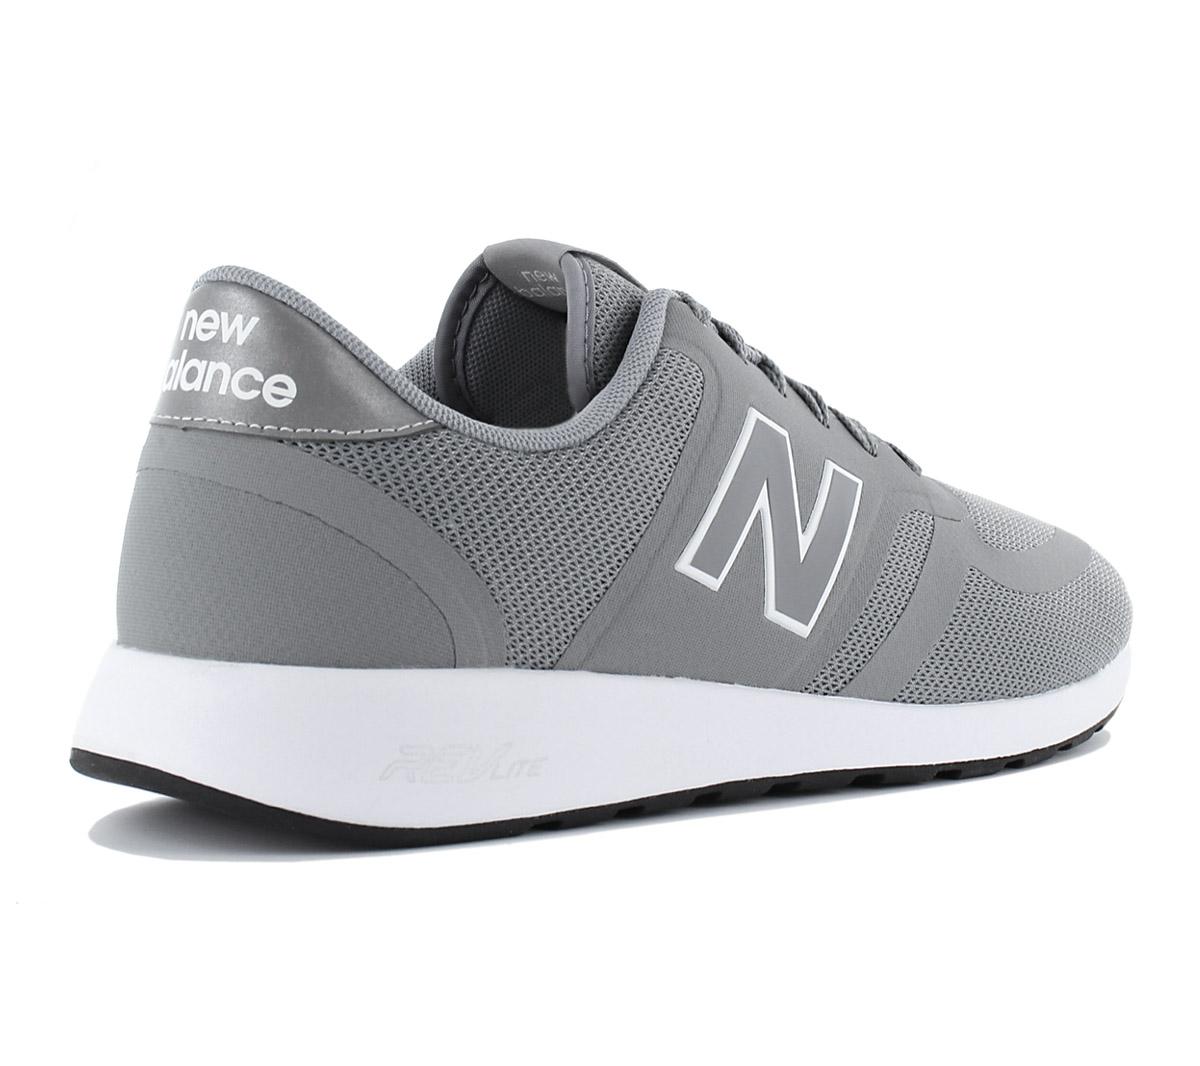 4523bfa79631 New Balance 420 Revlite Baskets   Chaussures Homme Grises Lunettes ...